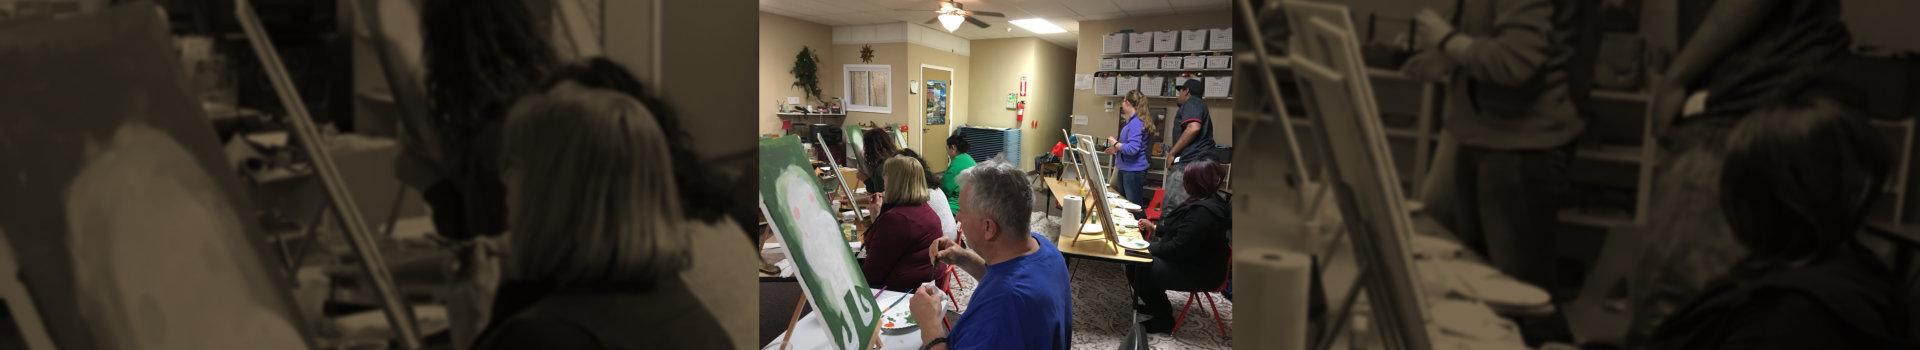 teachers doing painting